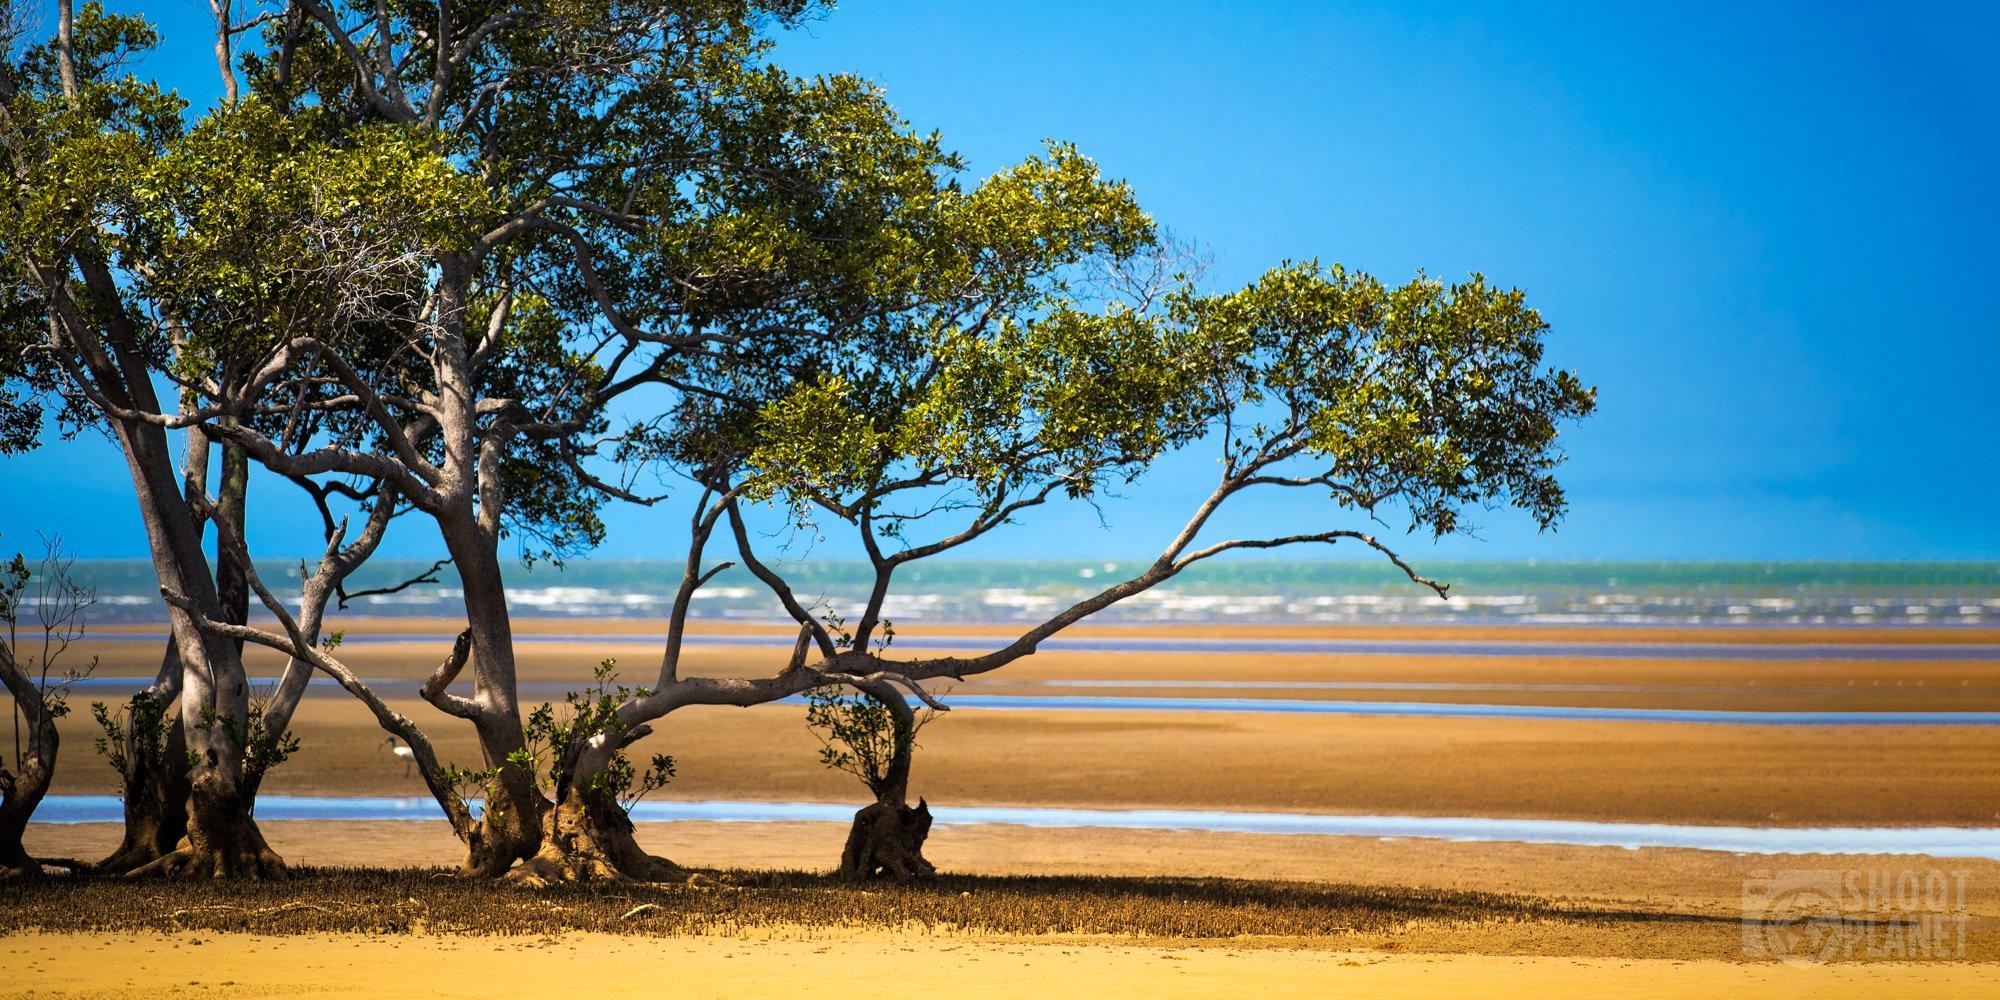 Mangrove trees on the beach, Brisbane, Australia